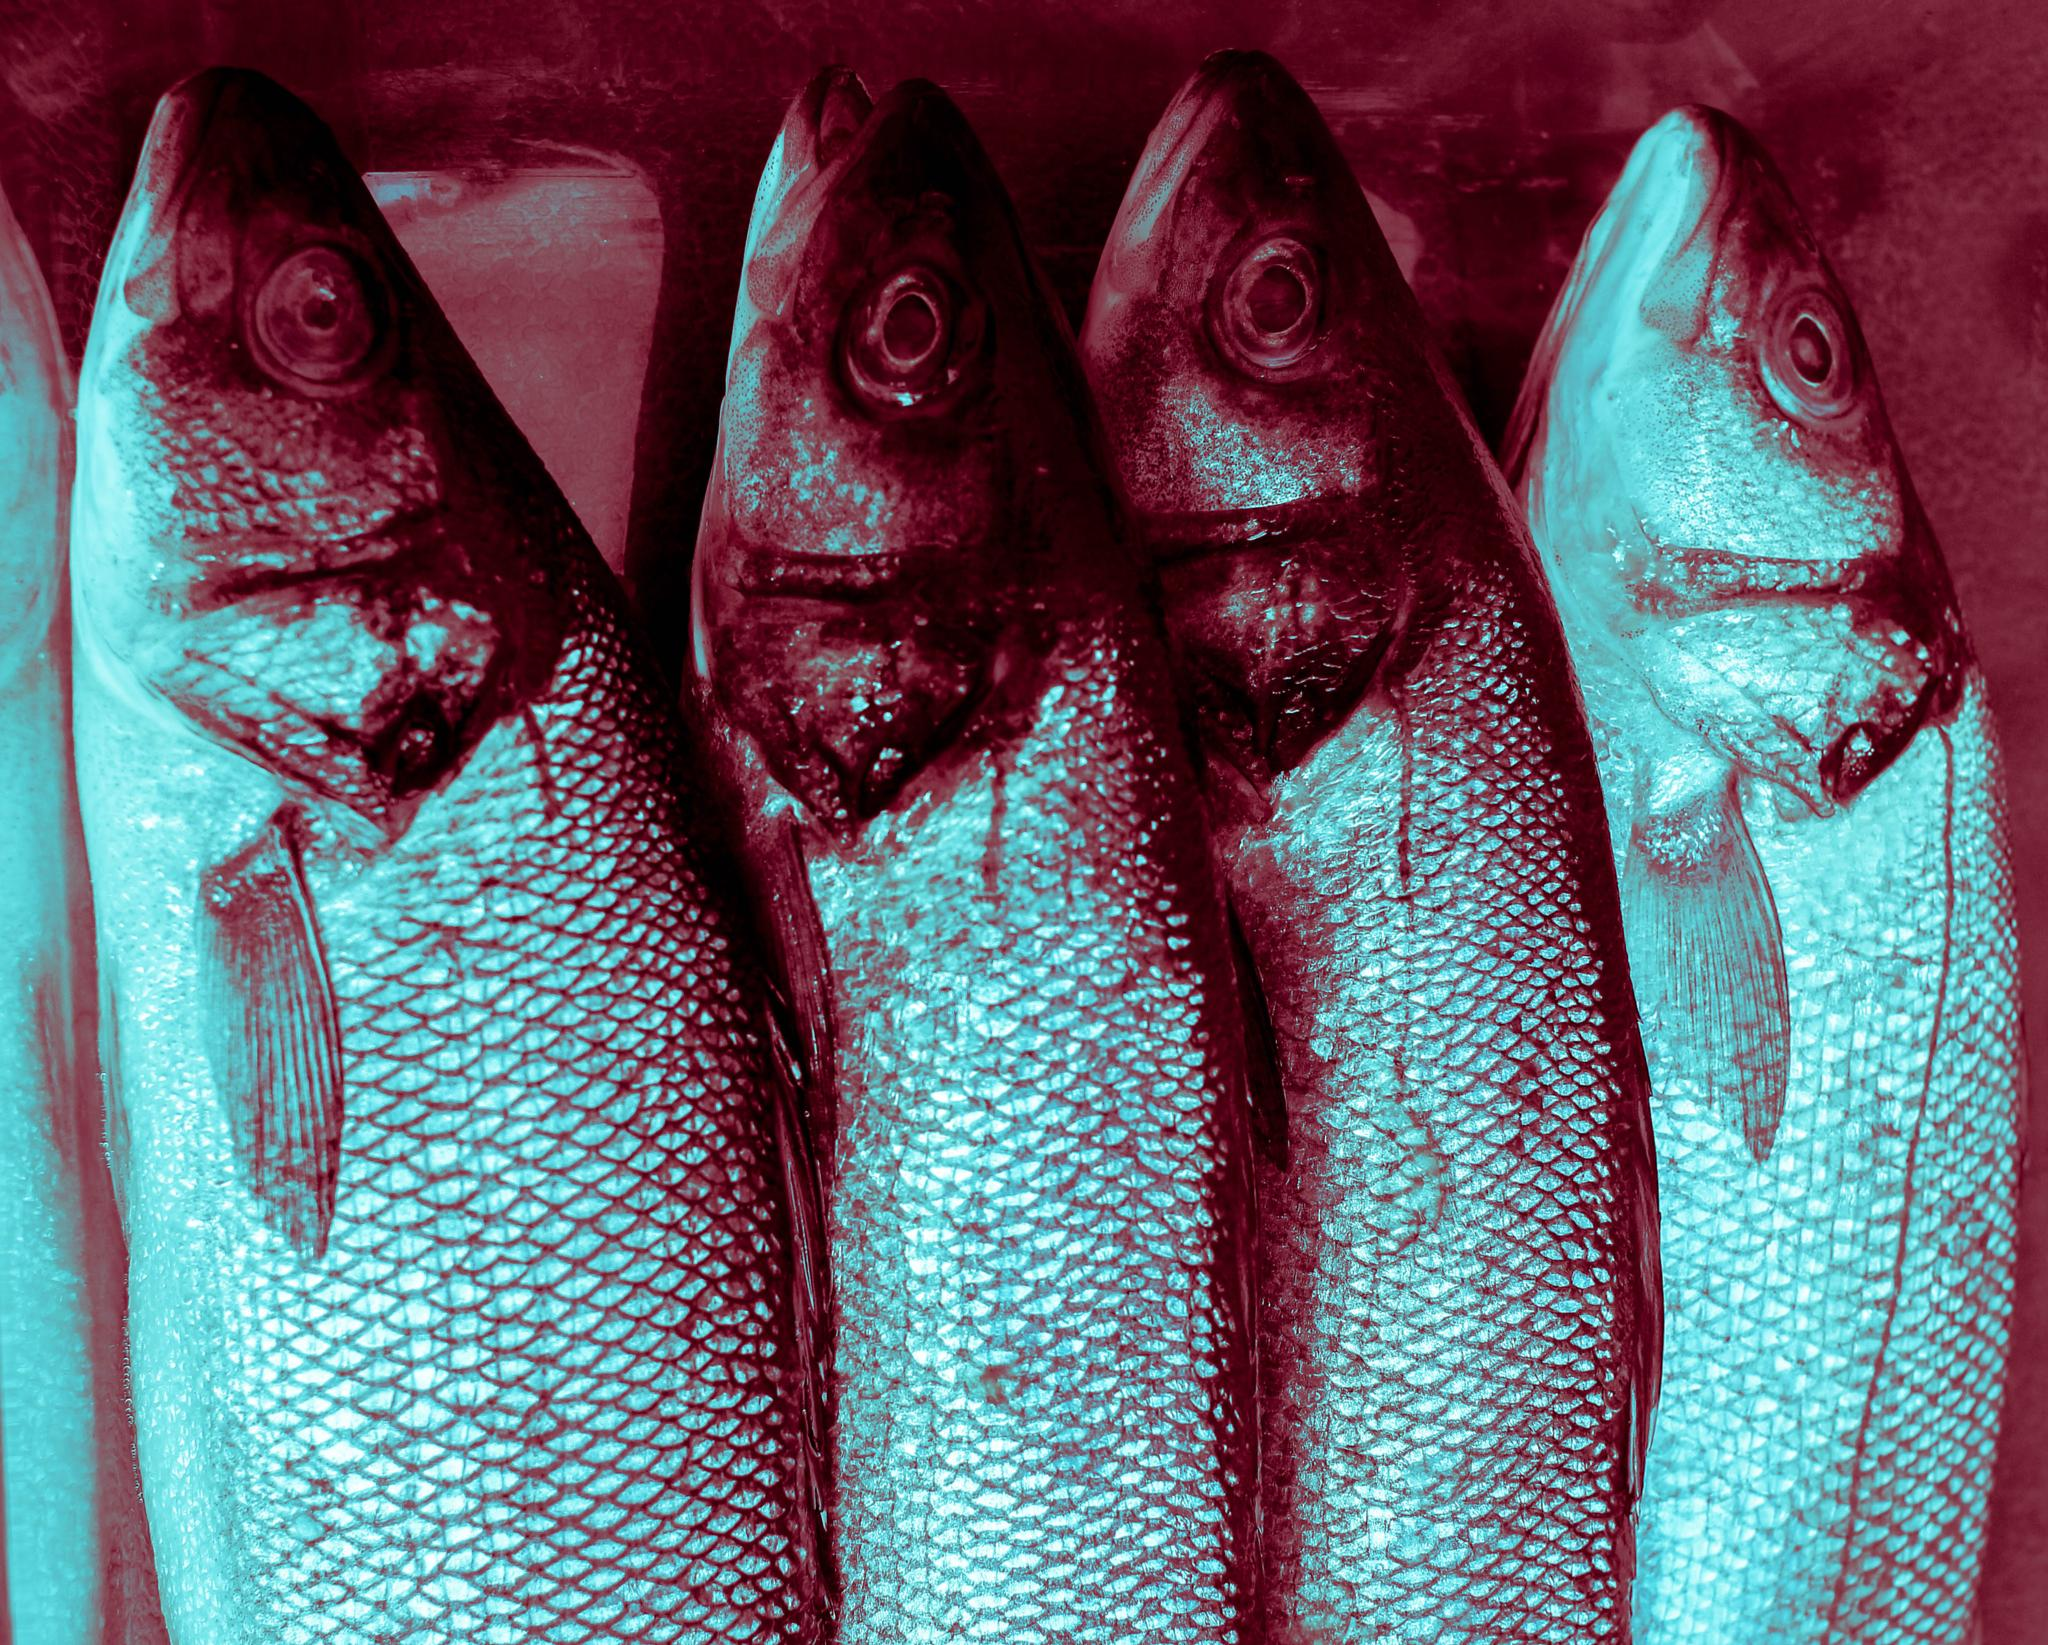 Something Fishy by bill.pritchard.581